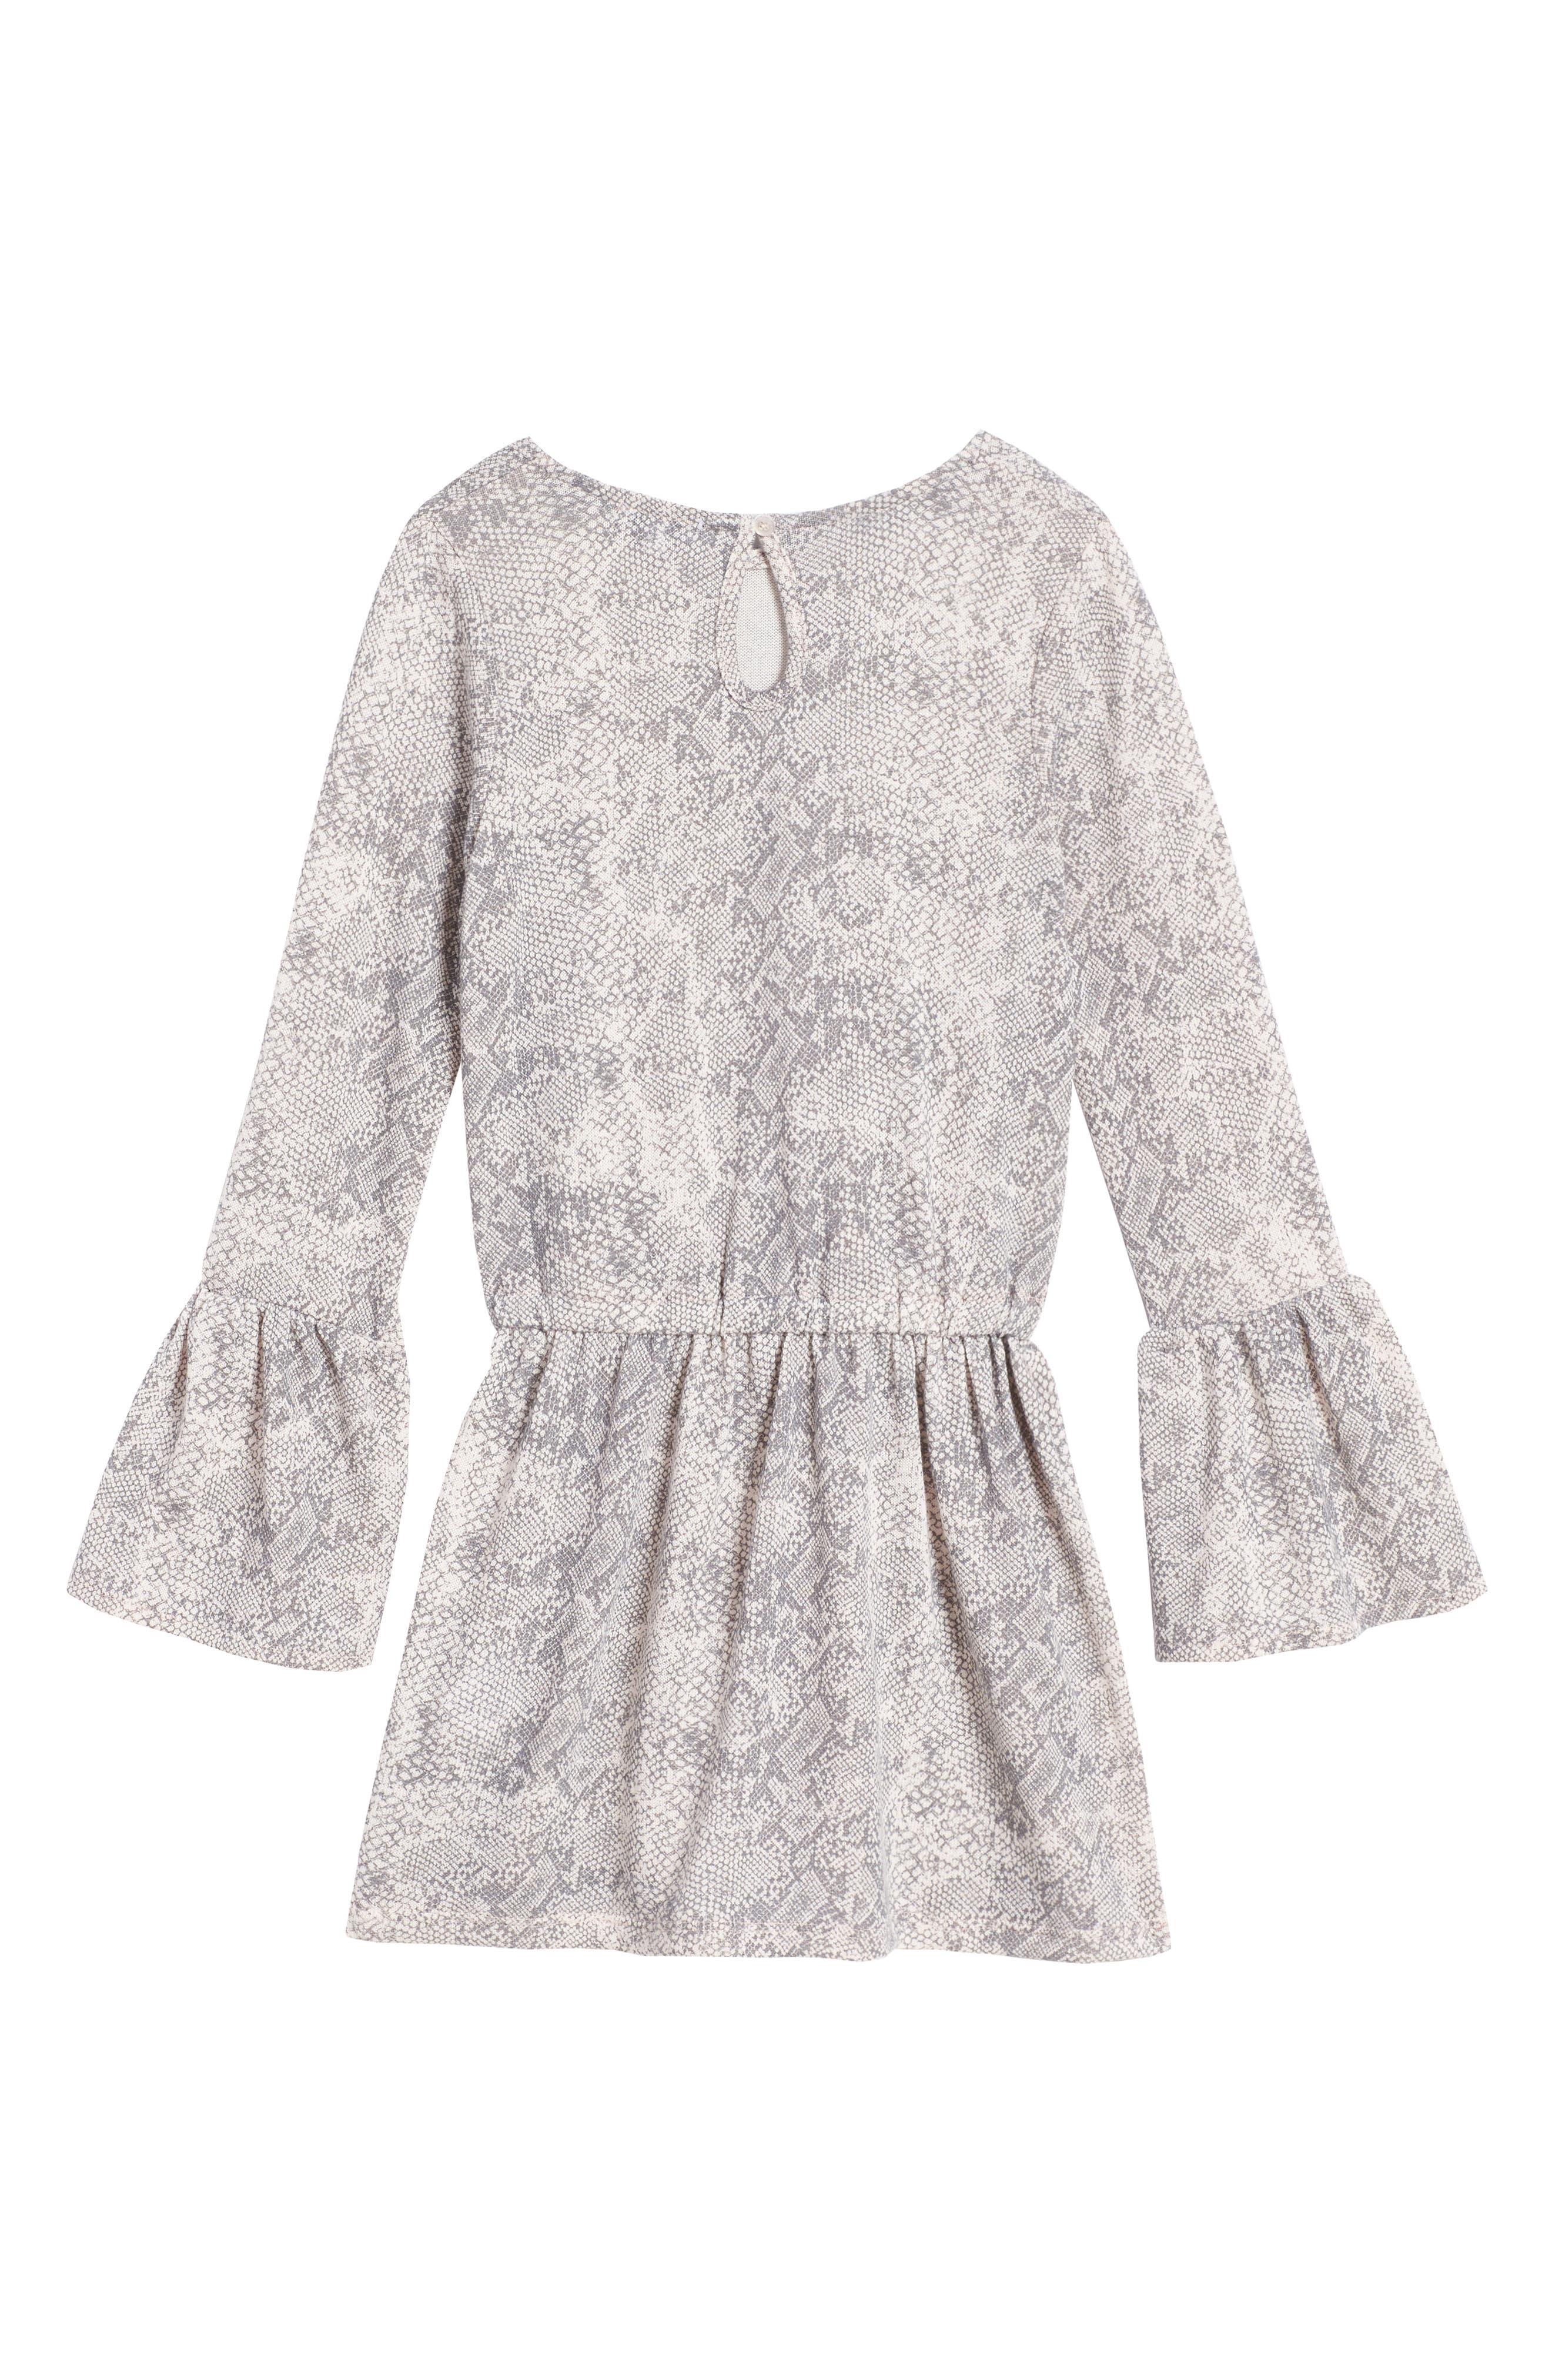 Python Print Loose Knit Dress,                             Alternate thumbnail 2, color,                             655